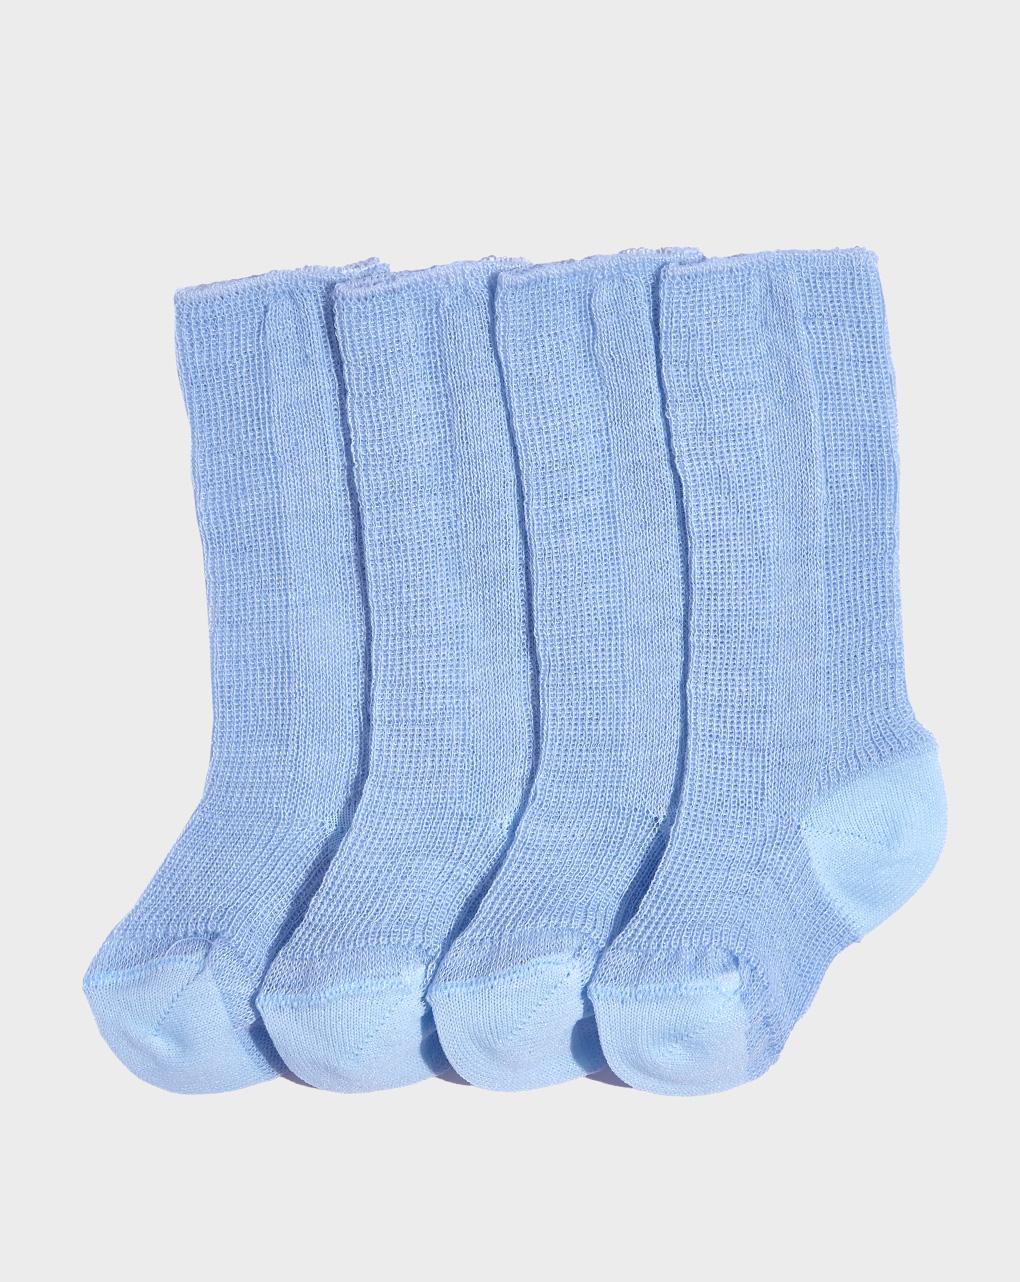 Pack 2 pezzi calzine primi giorni in lana - Prénatal